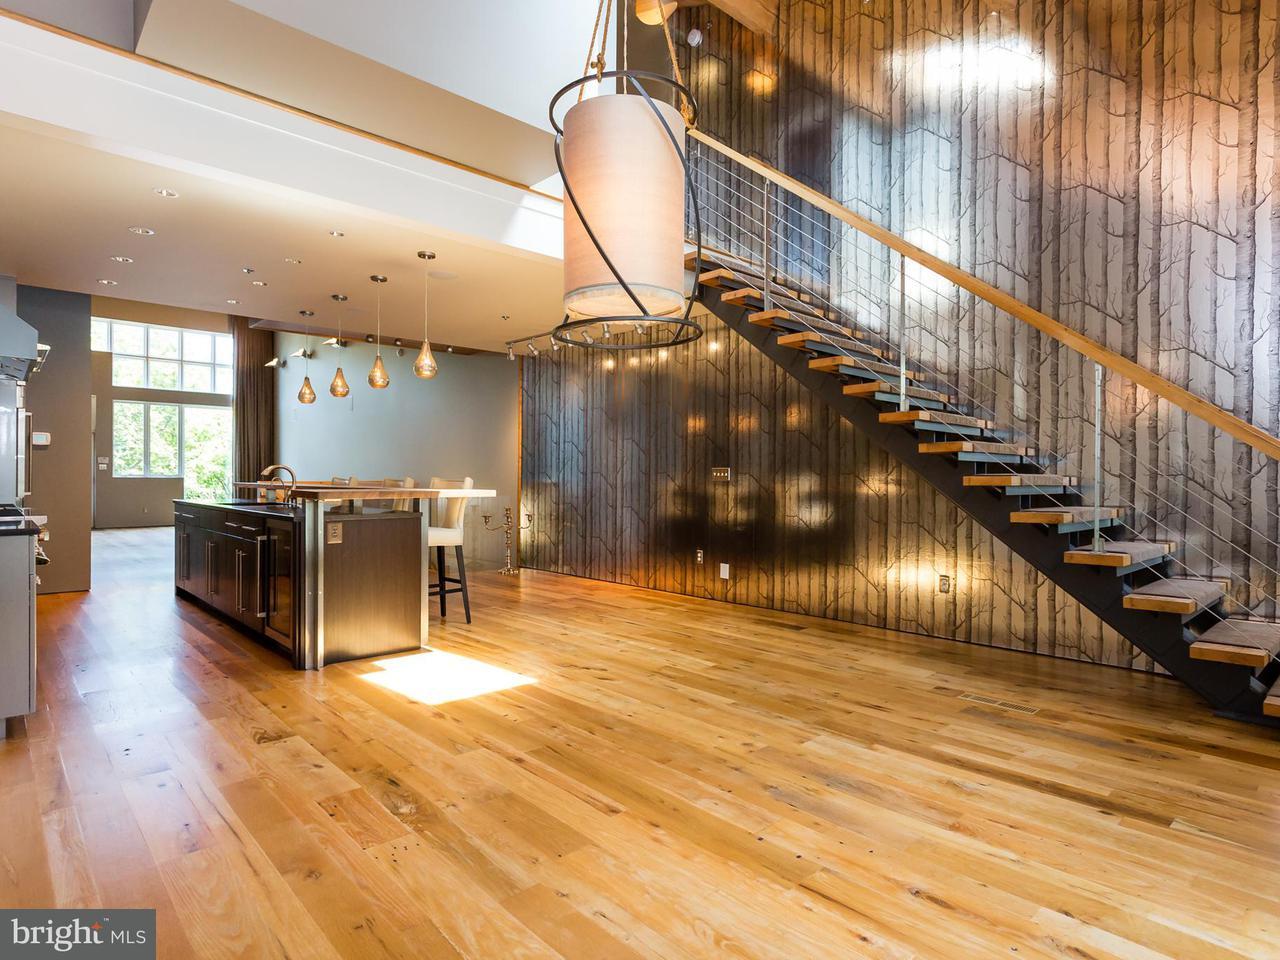 Additional photo for property listing at 719 Kenmore Avenue 719 Kenmore Avenue Fredericksburg, Βιρτζινια 22401 Ηνωμενεσ Πολιτειεσ